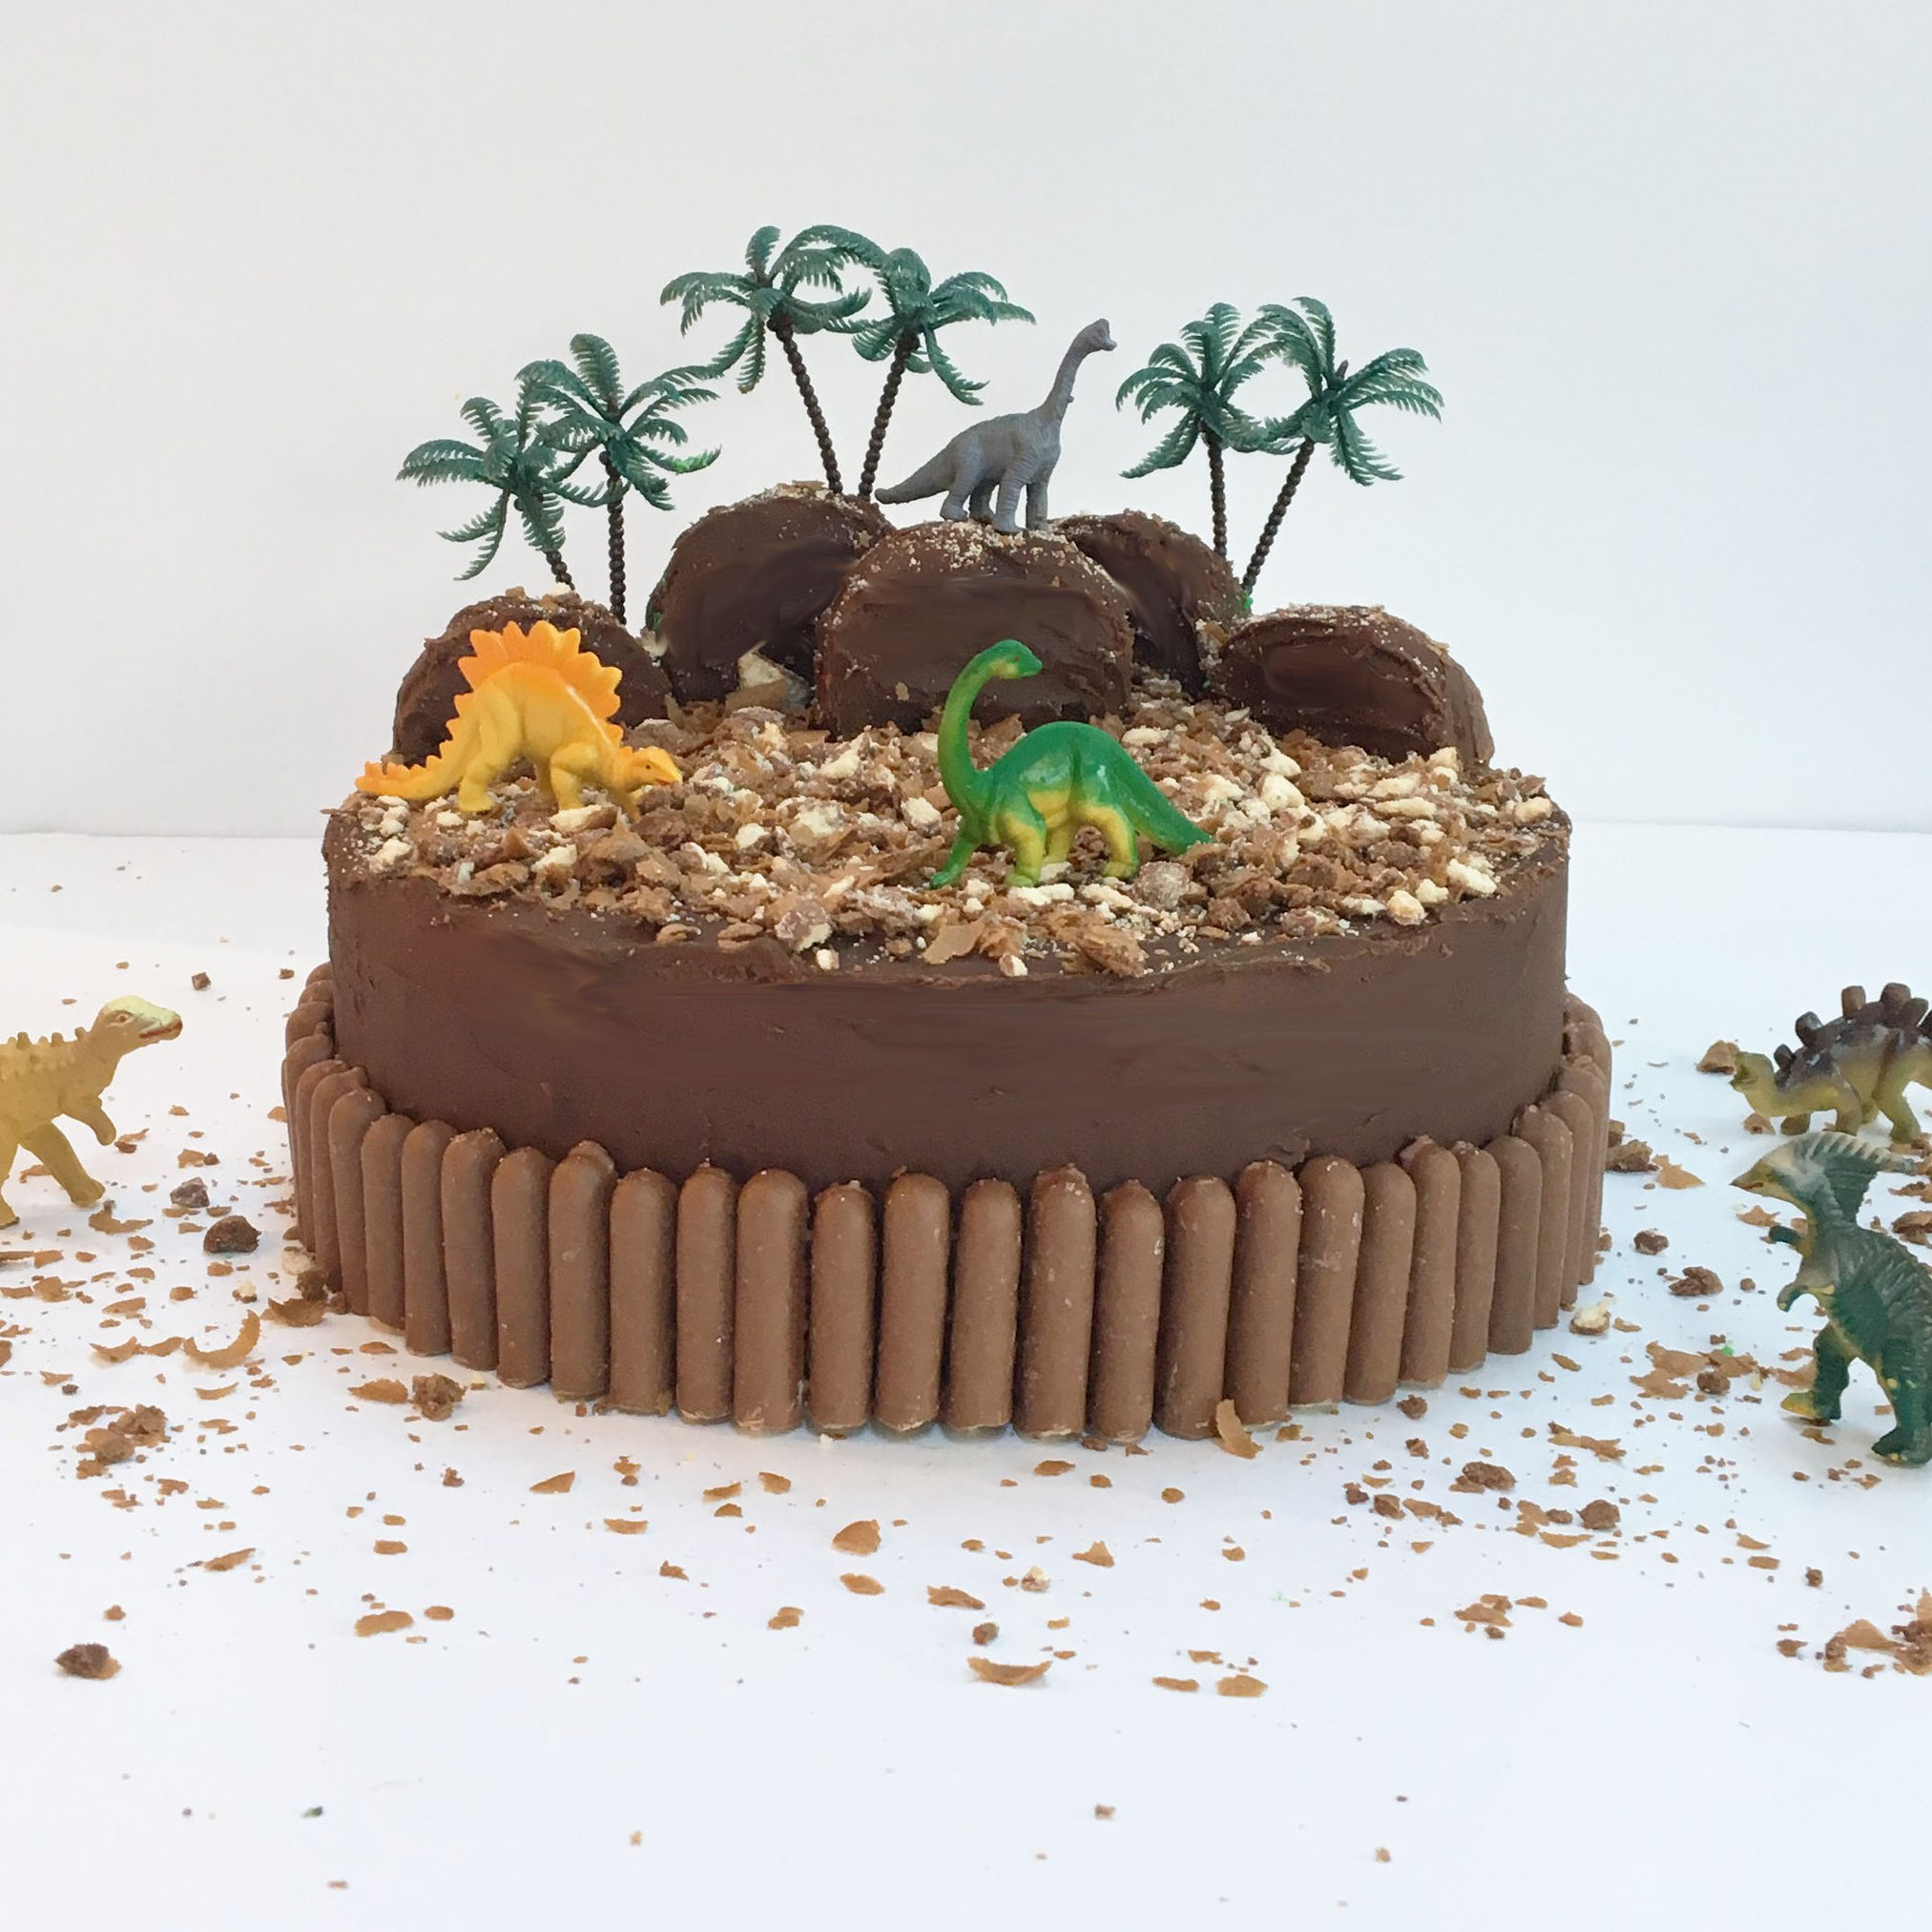 Dinosaur land cake kit yumbles dinosaur land cake kit solutioingenieria Image collections